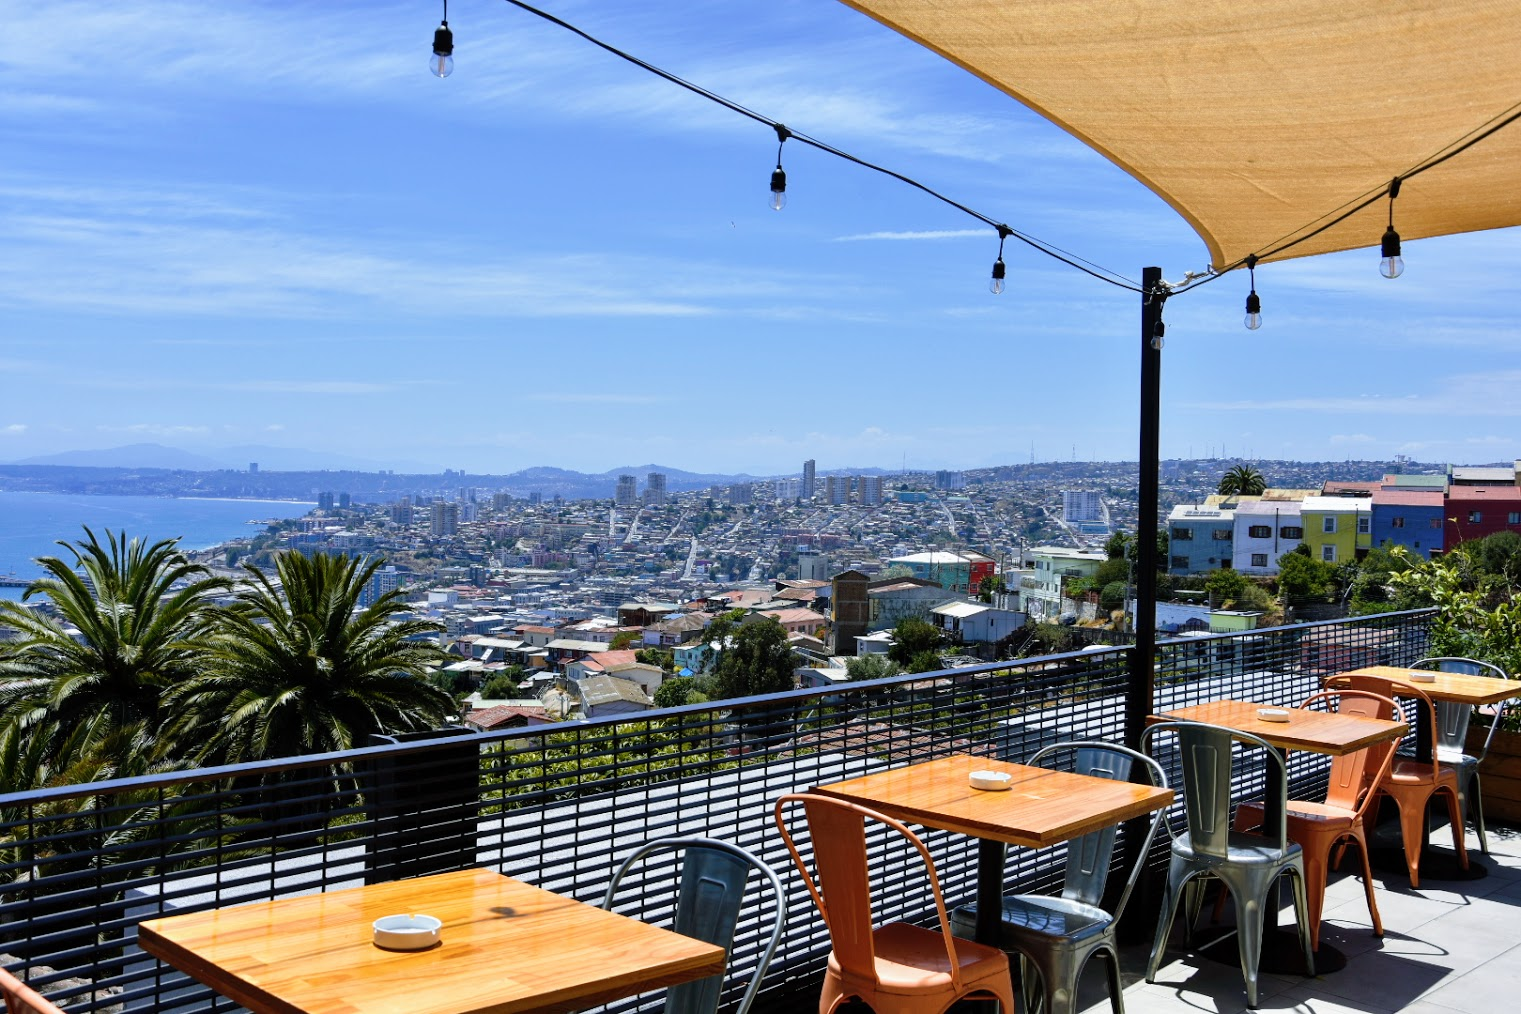 valparaiso restaurant